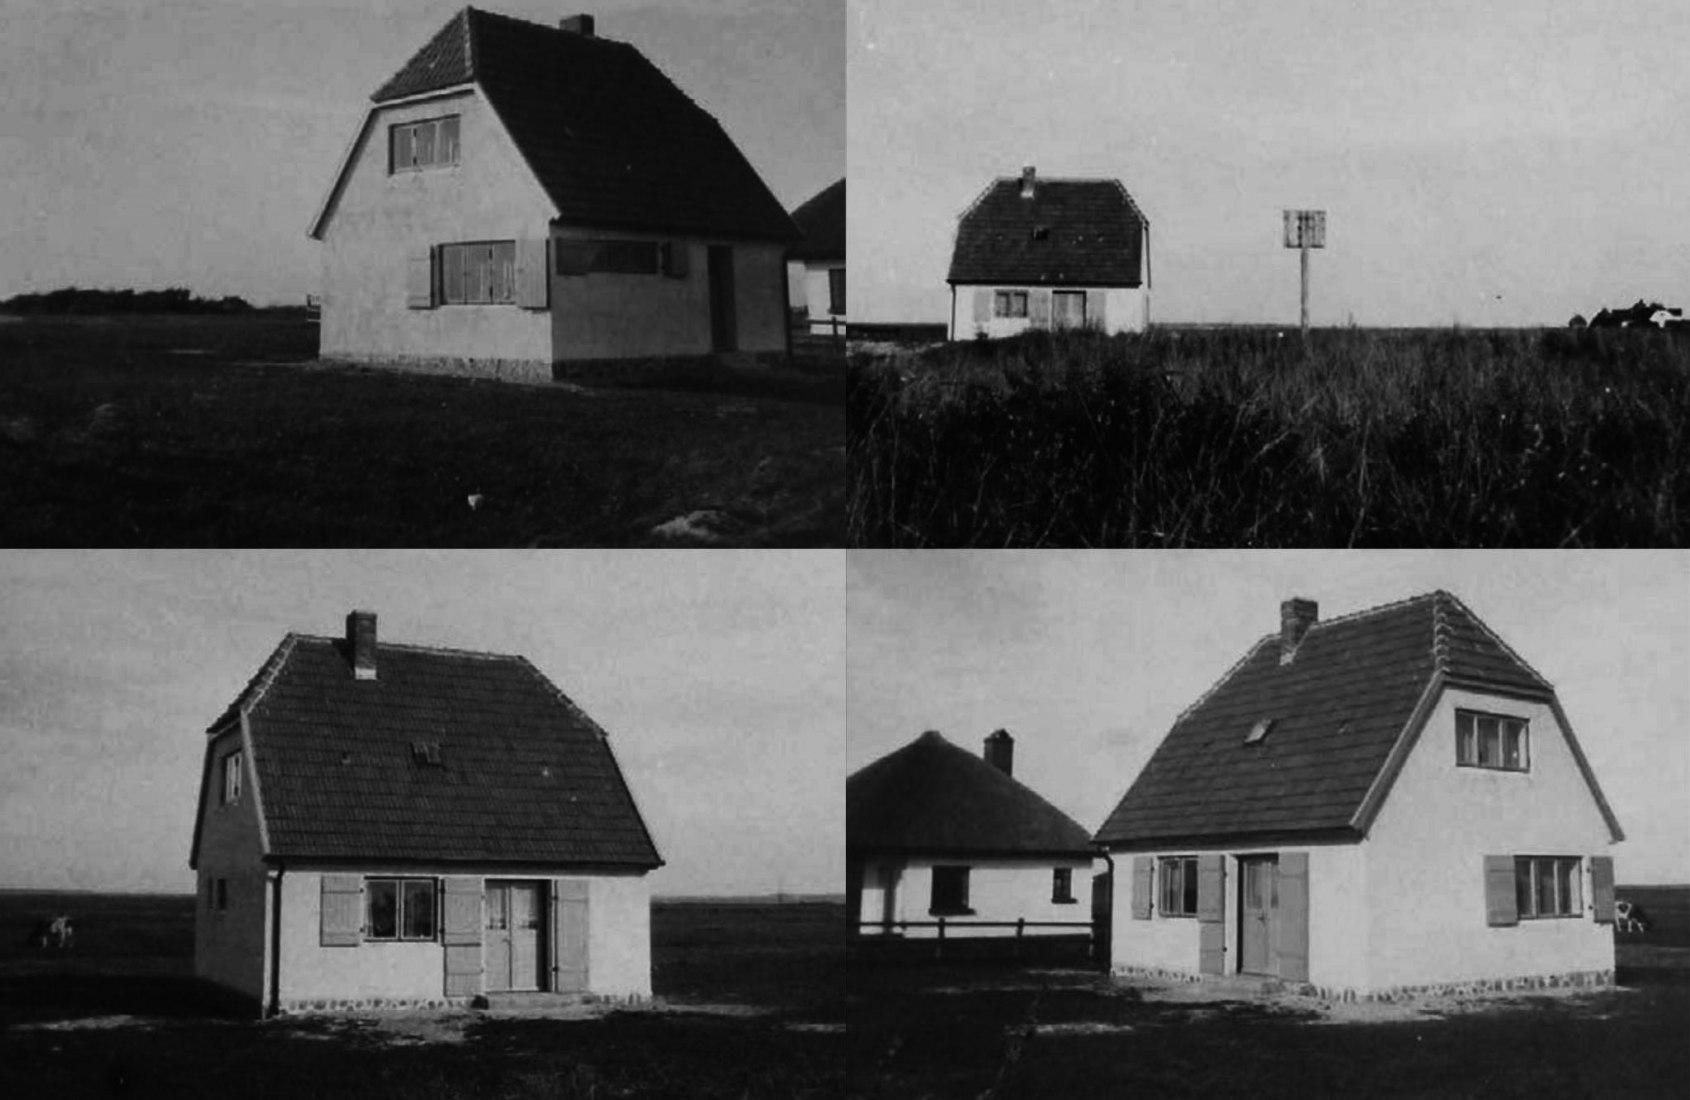 Casa Karl Haertel diseñada por Annemarie Wilke, entre 1936-1937.